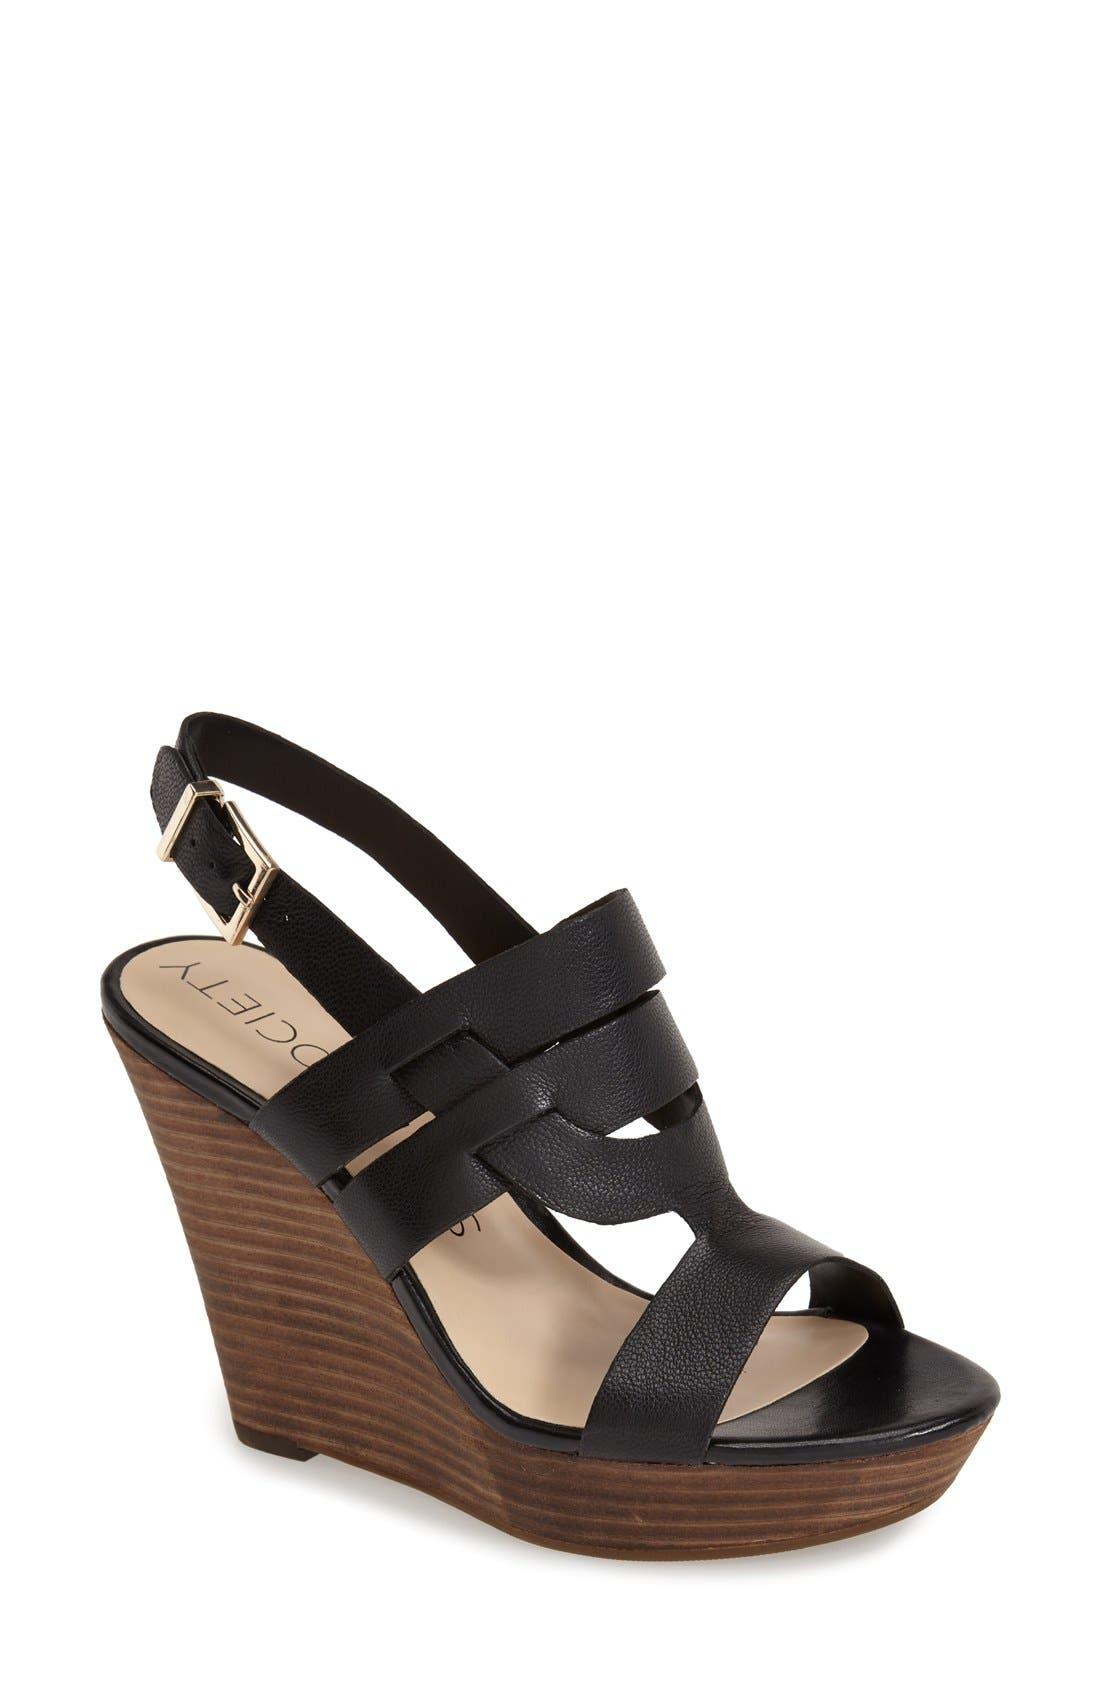 Main Image - Sole Society 'Jenny' Slingback Wedge Sandal (Women)